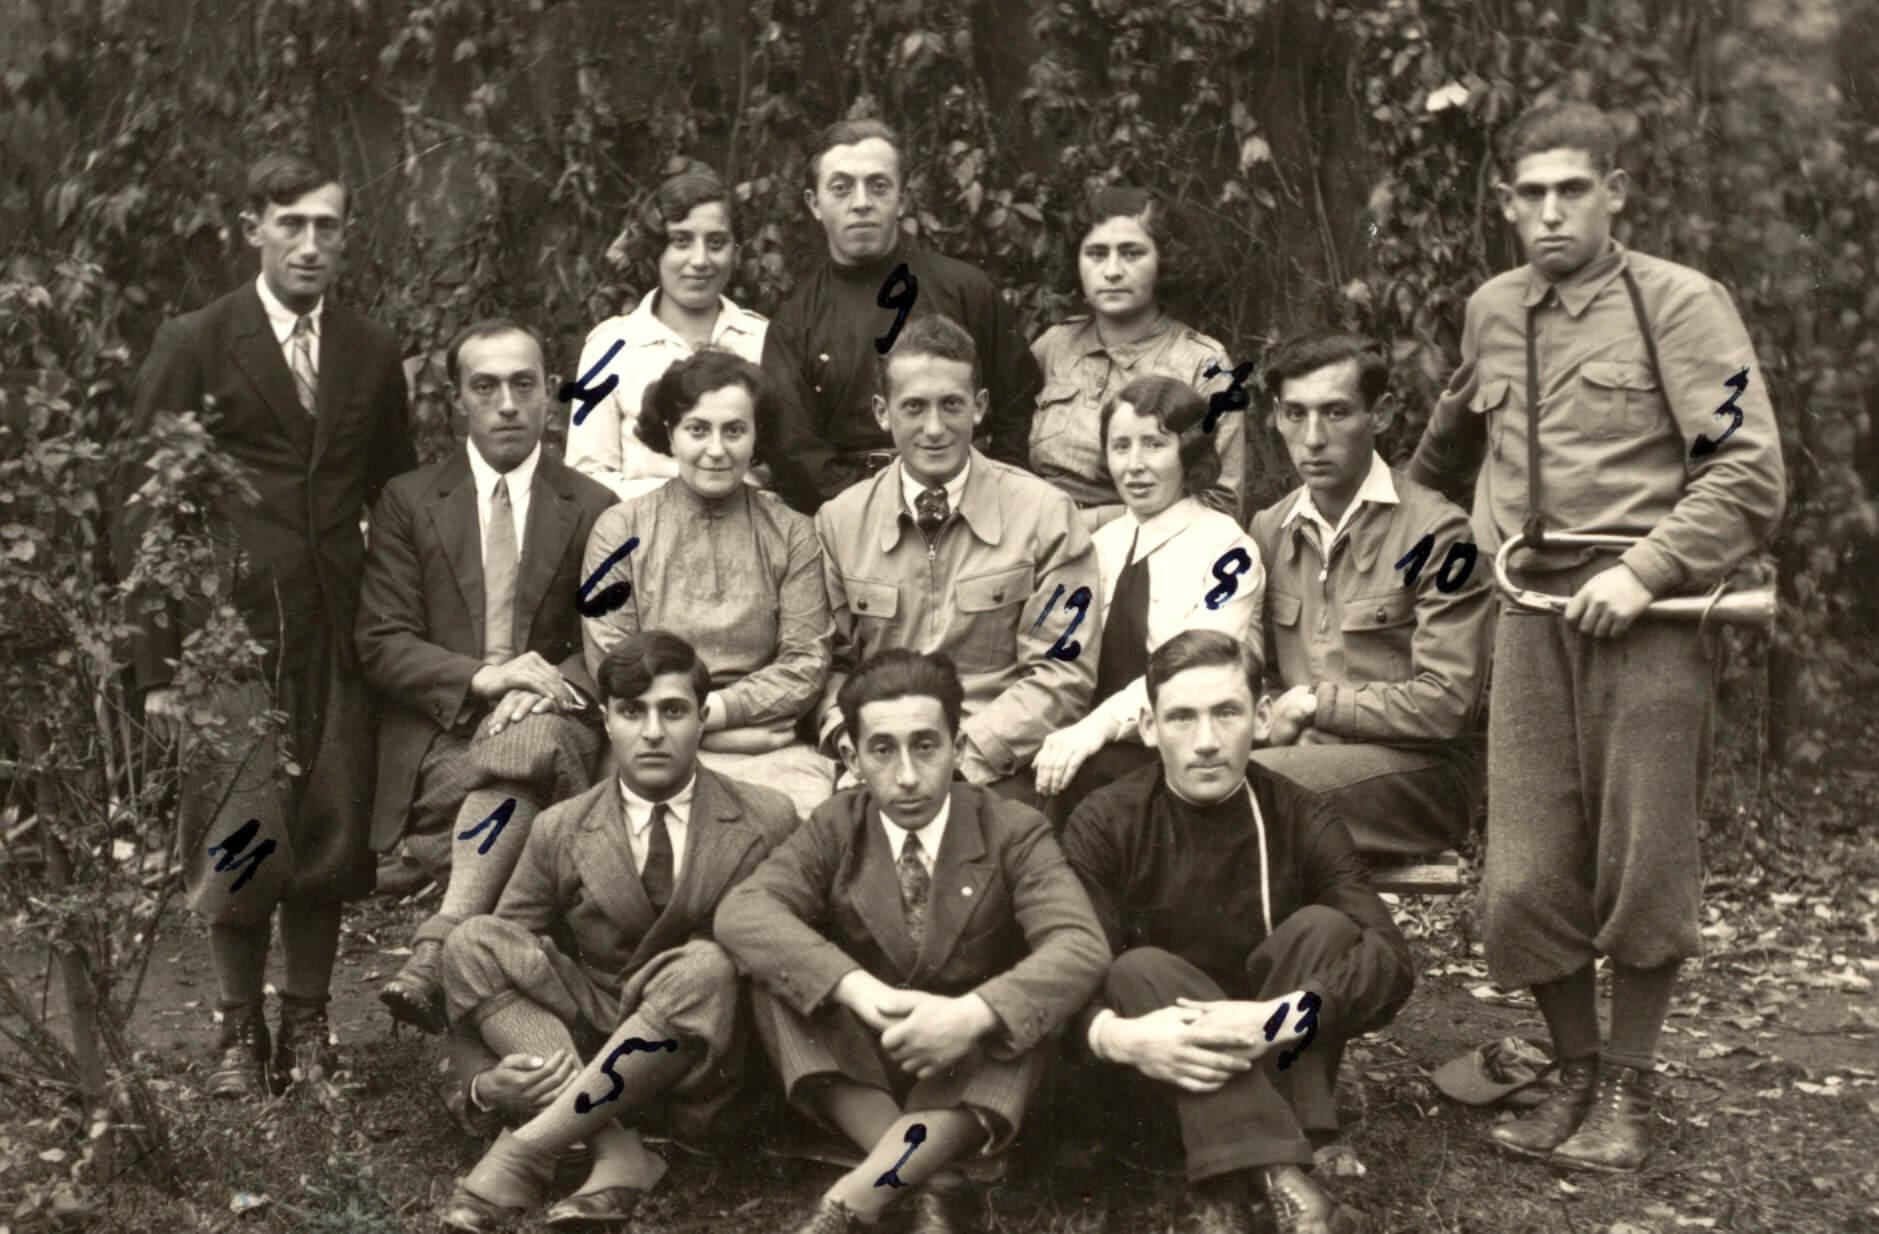 Israel's Polish Roots